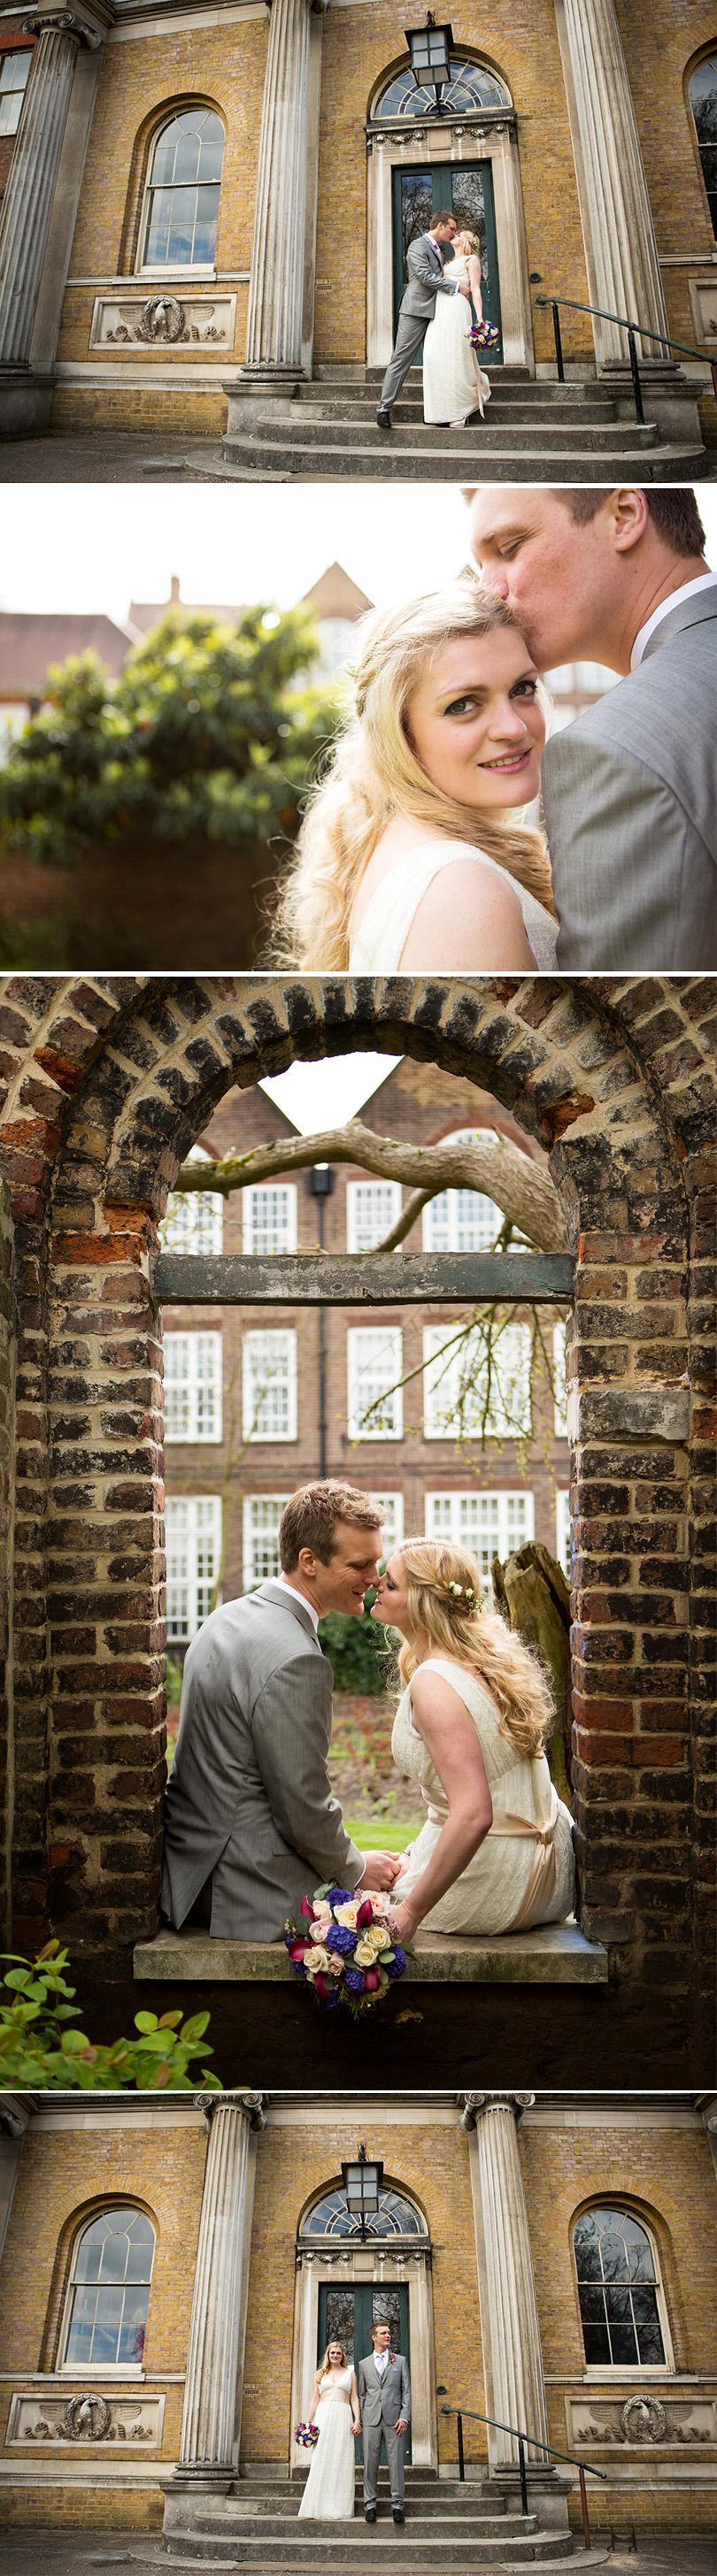 PM-Gallery-Ealing-Wedding-5.jpg